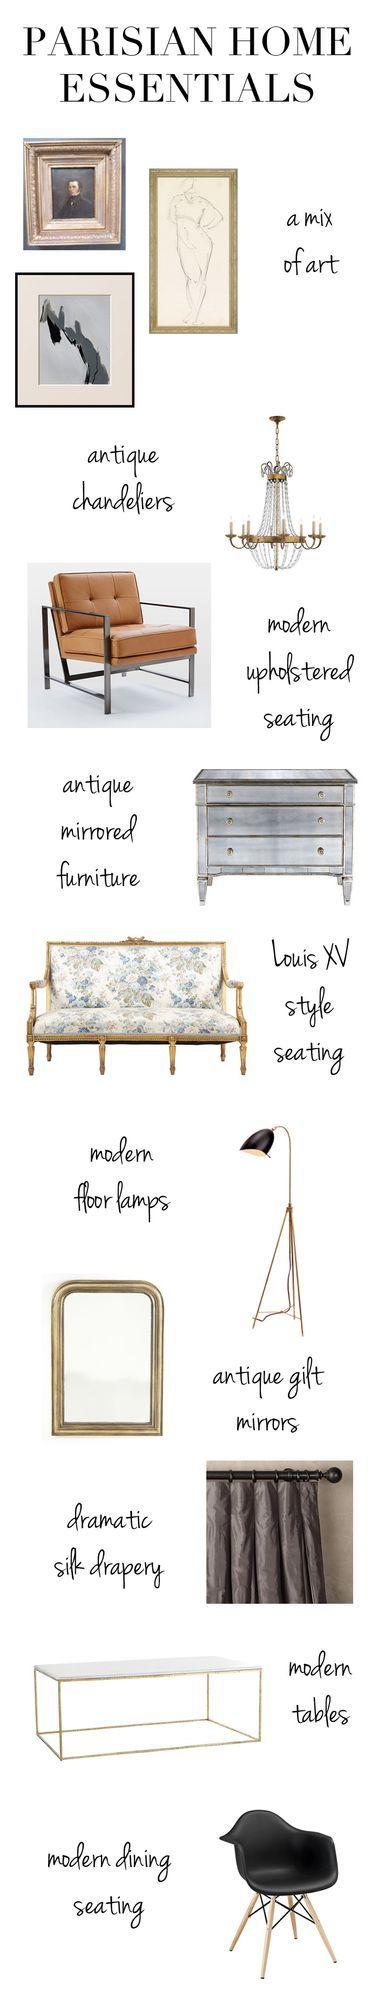 Parisian Style at Home & On You! (via Bloglovin.com )